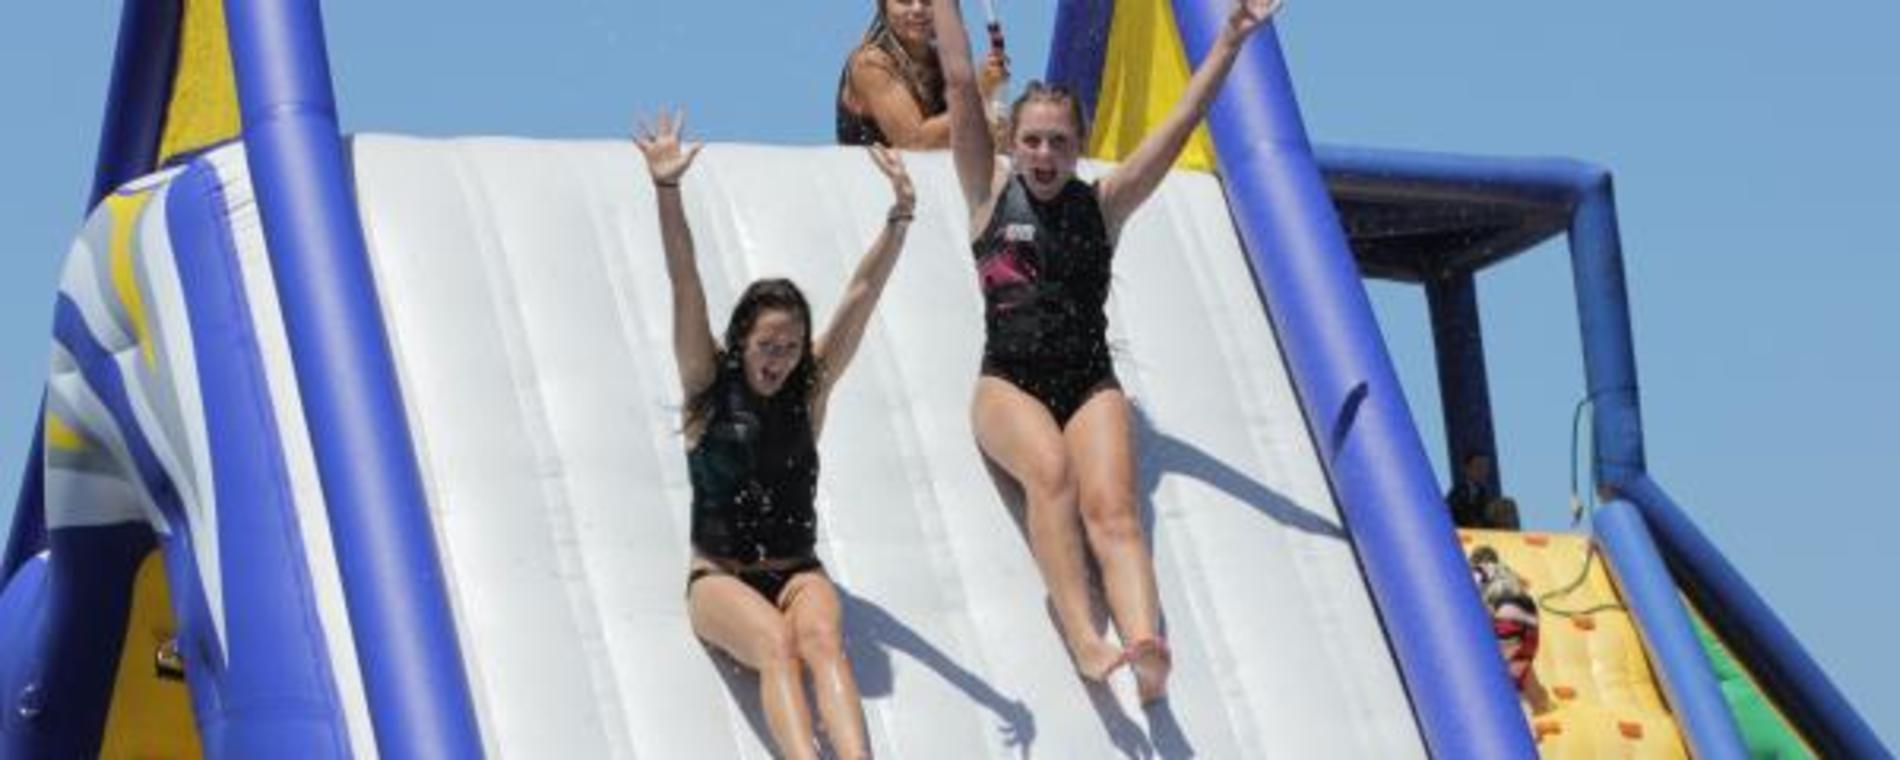 Splash water slide Visit Wichita